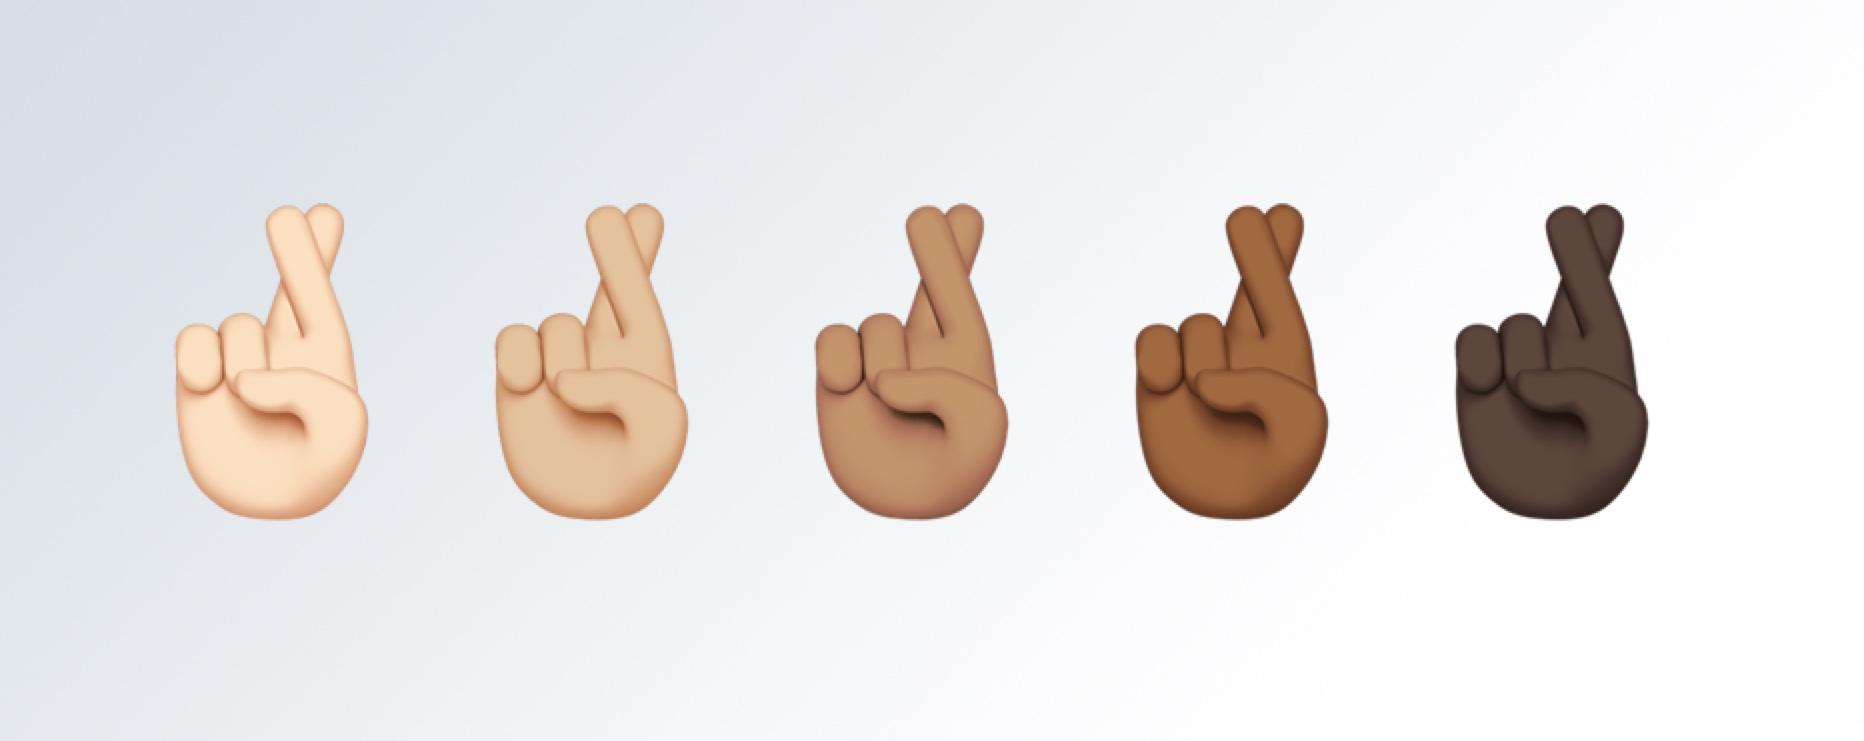 Fingers crossed emoticon facebook